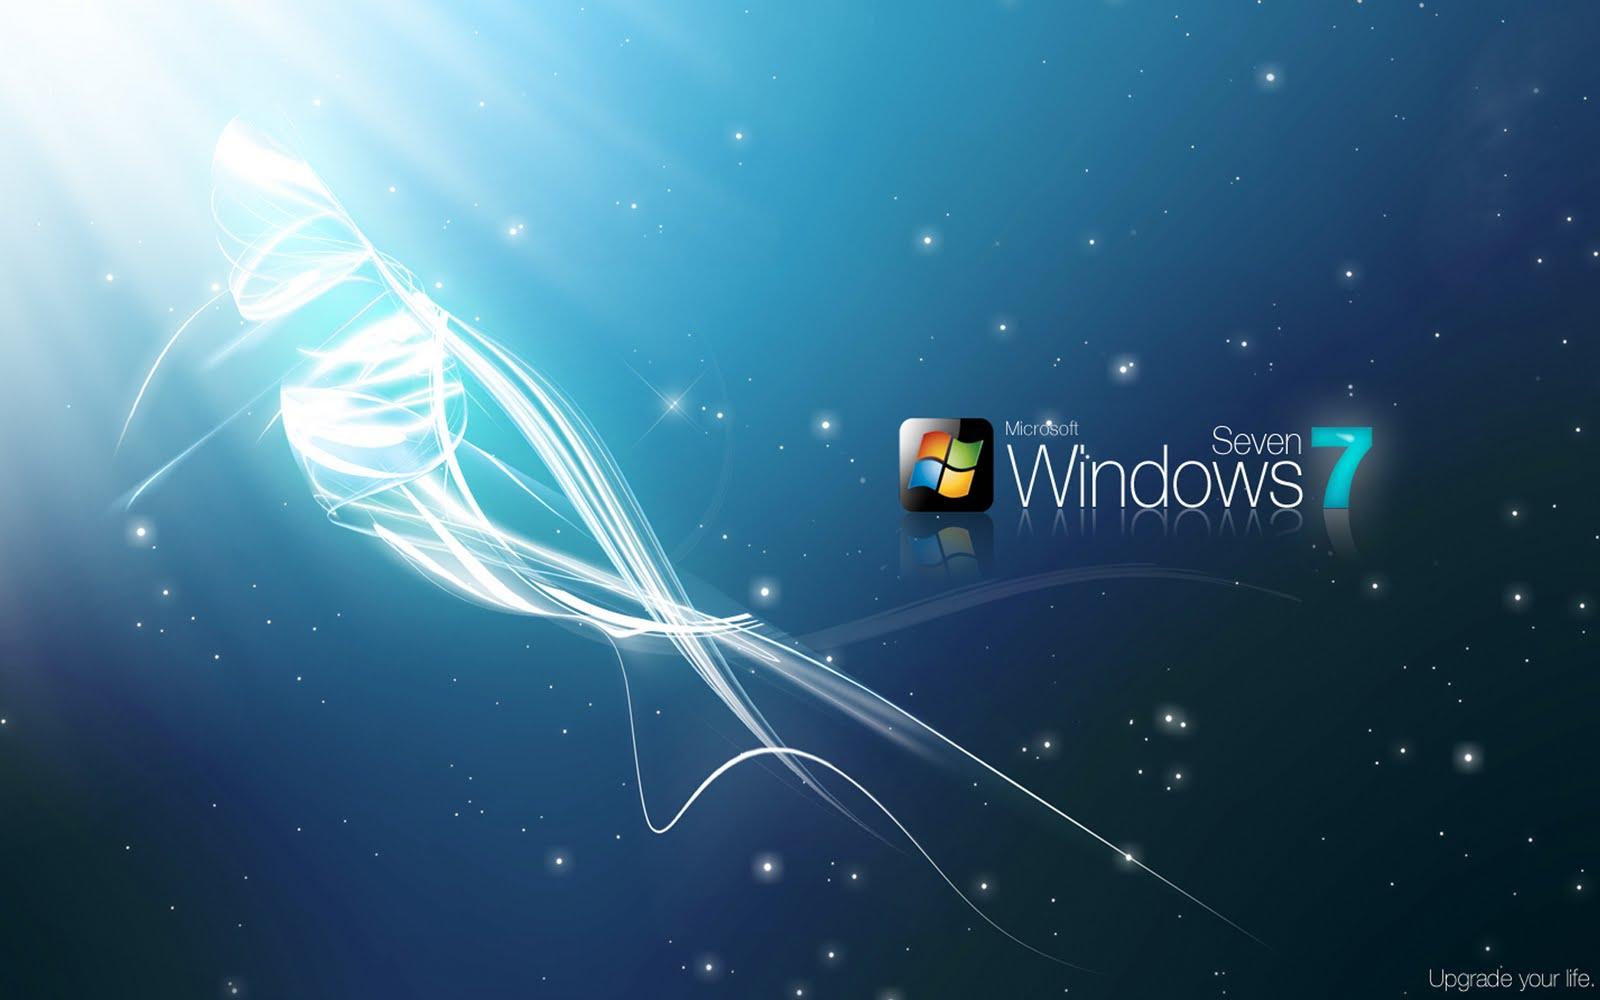 Windows 7 Wallpaper - 1920x1200 | Hd Desktop Wallpaper